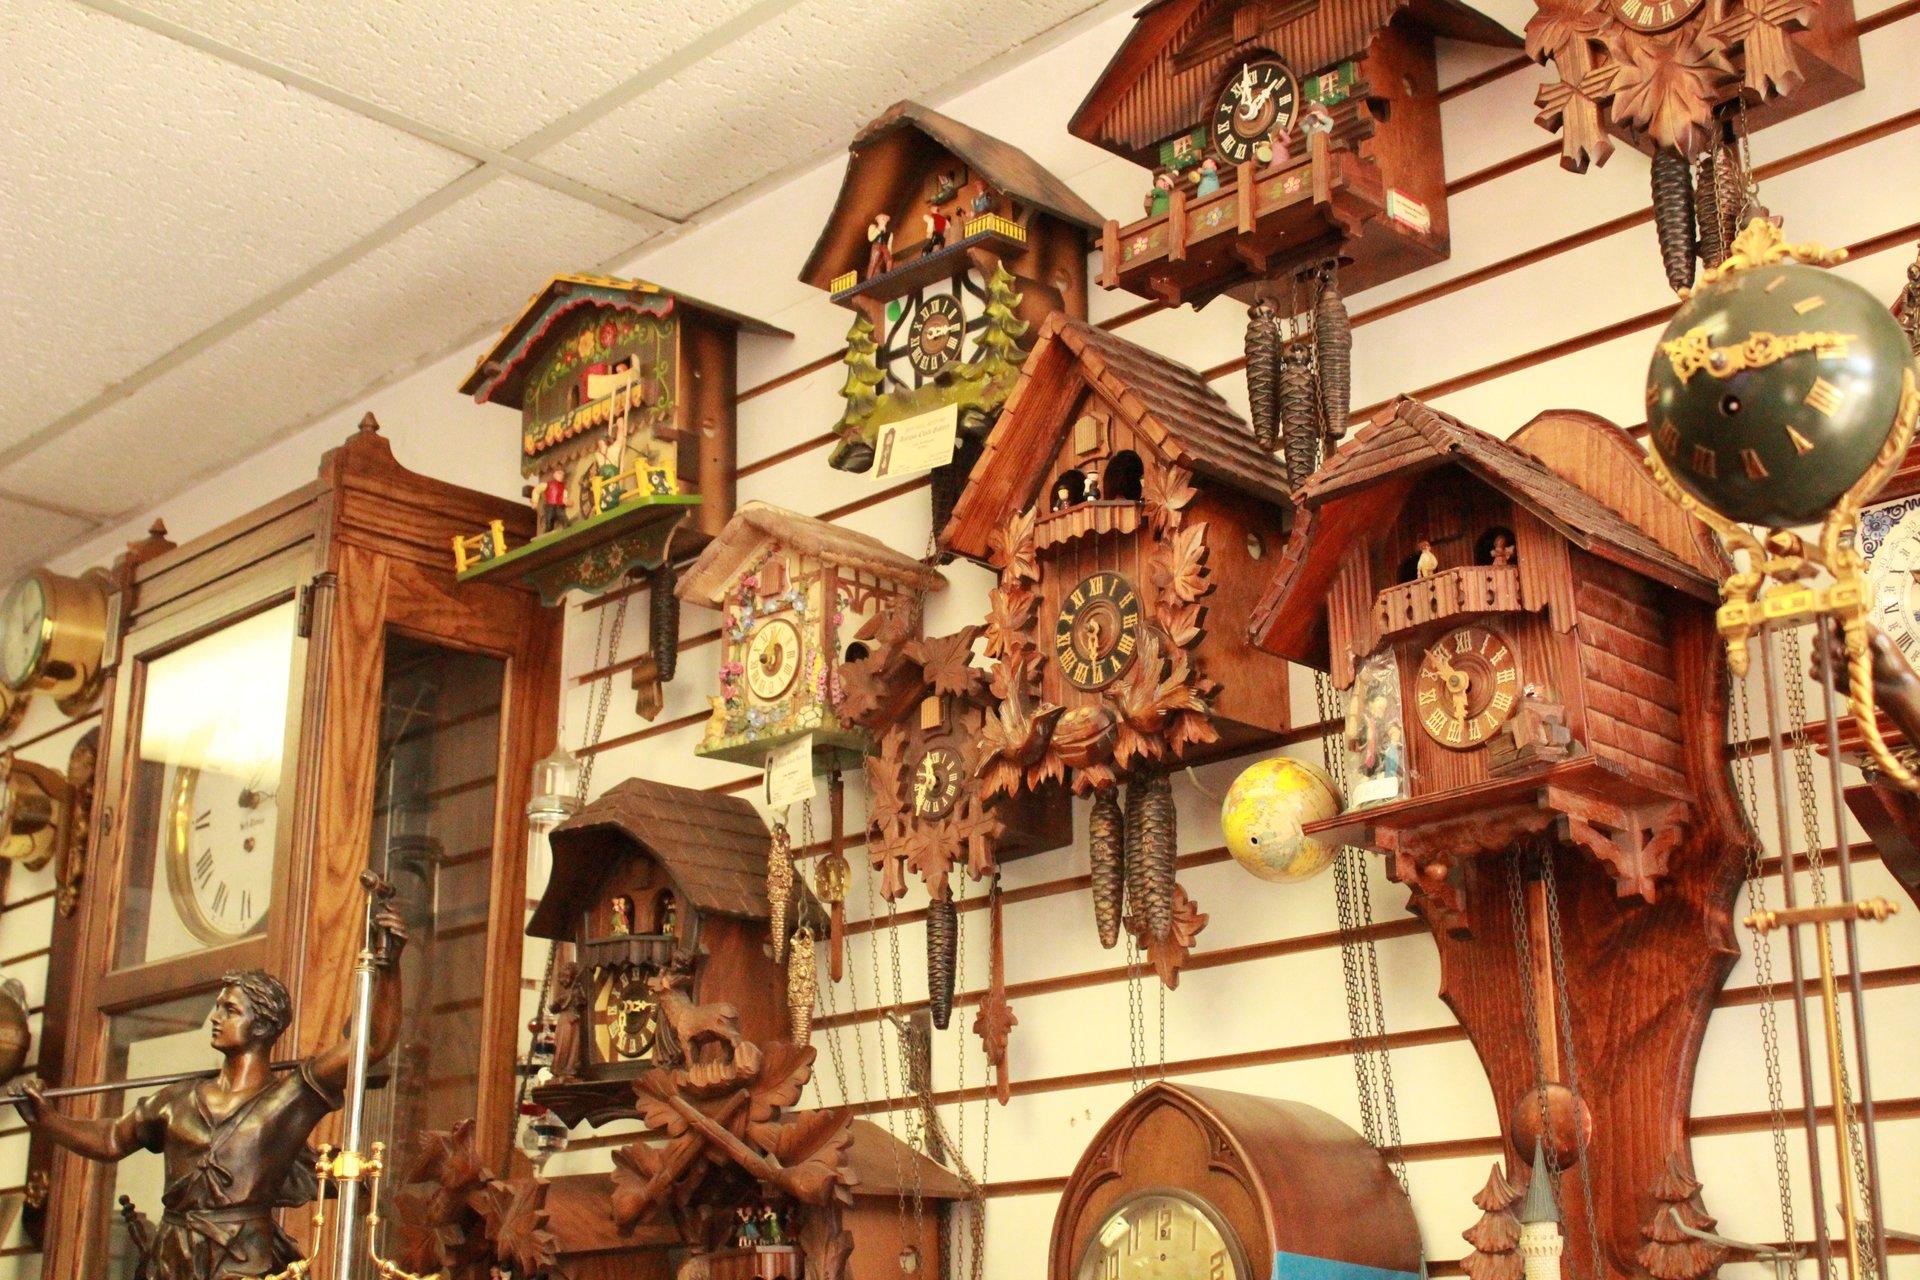 Antique Clock Gallery image 7